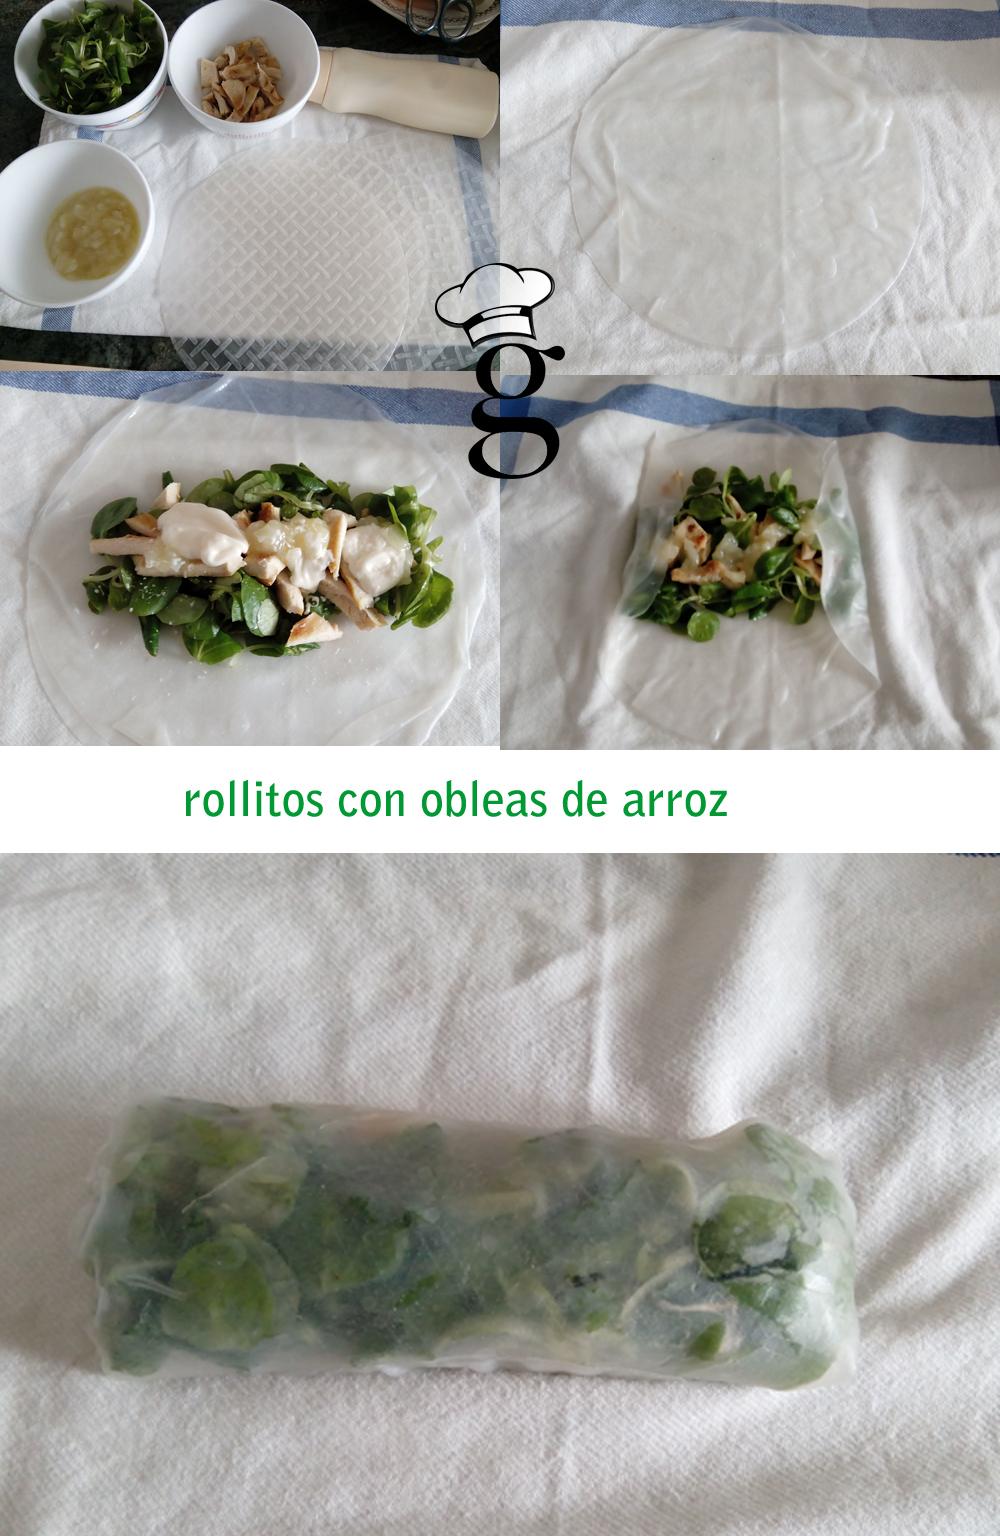 rollitos_obleas_arroz_glutoniana2